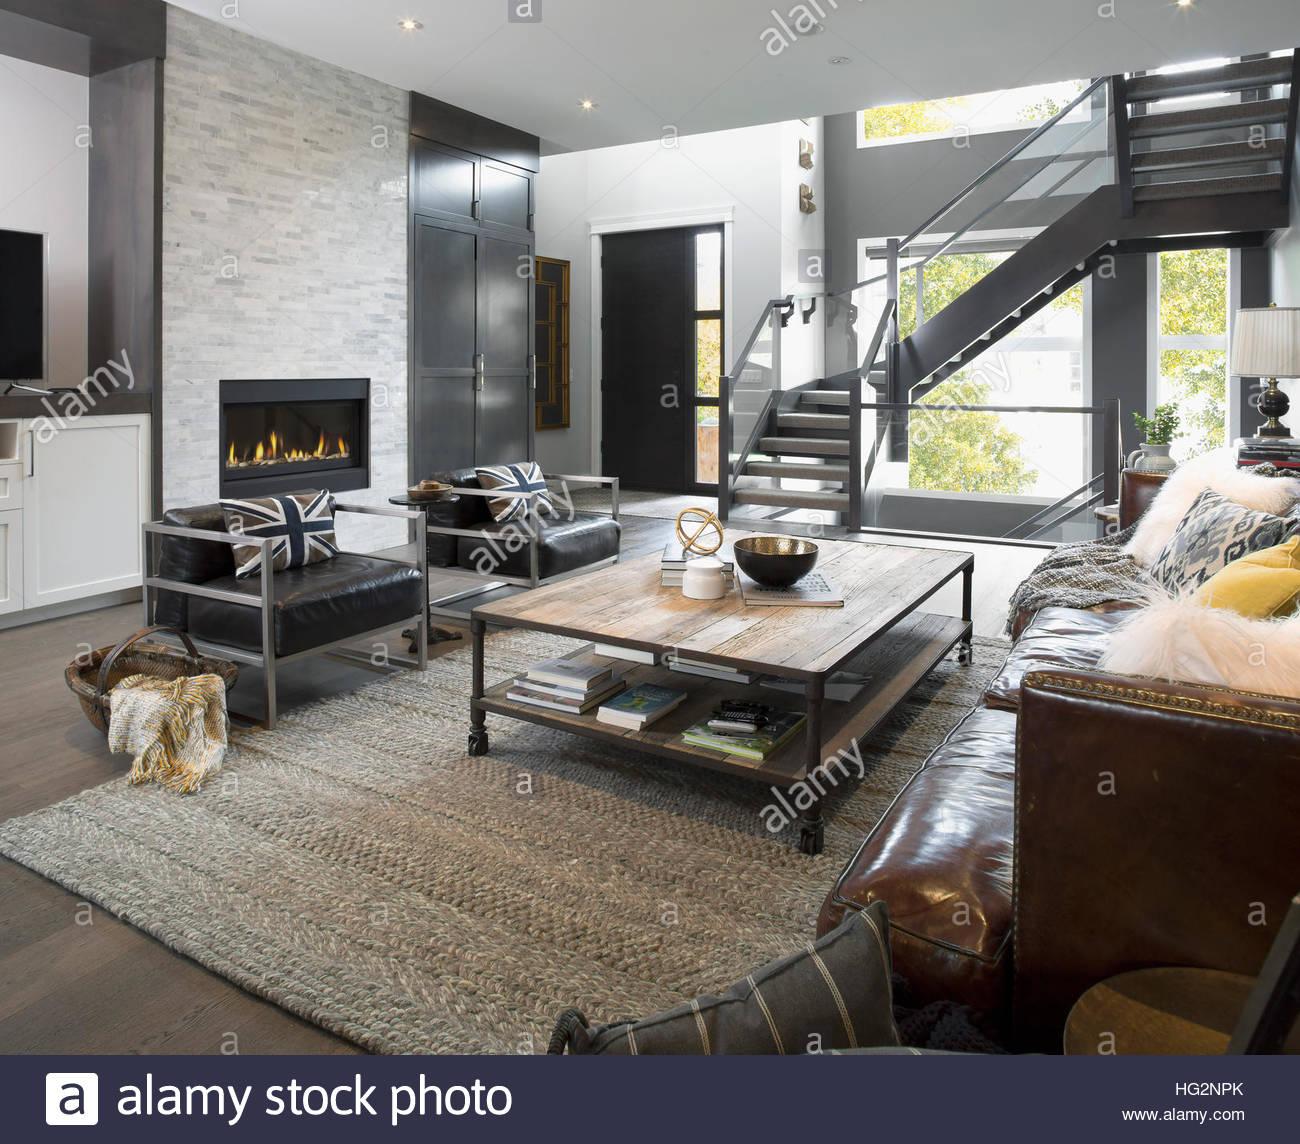 Modern Interior Fireplace Staircase Stockfotos & Modern Interior ...